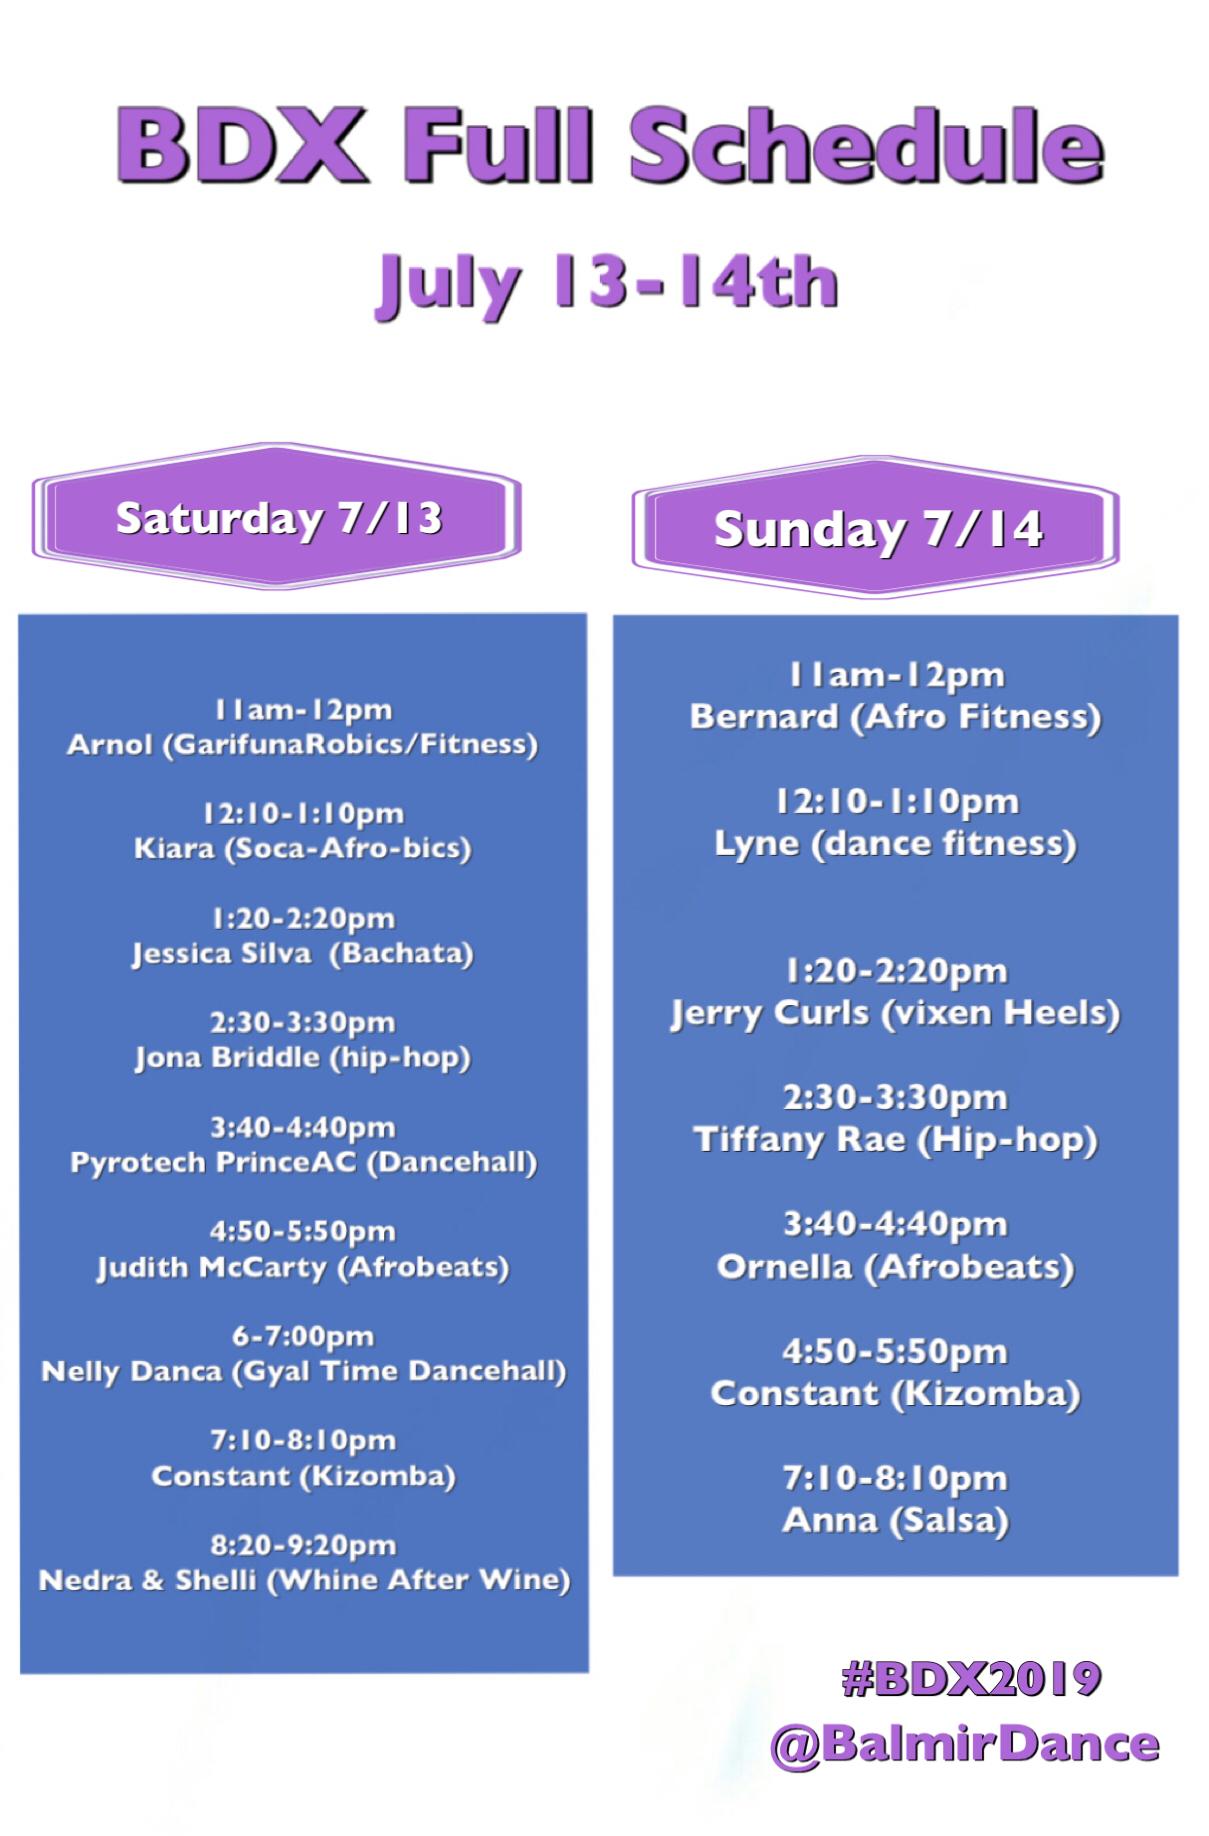 BDX 2019 Schedule Brooklyn NYC Dance Class Intensive July 13 and July 14.jpeg